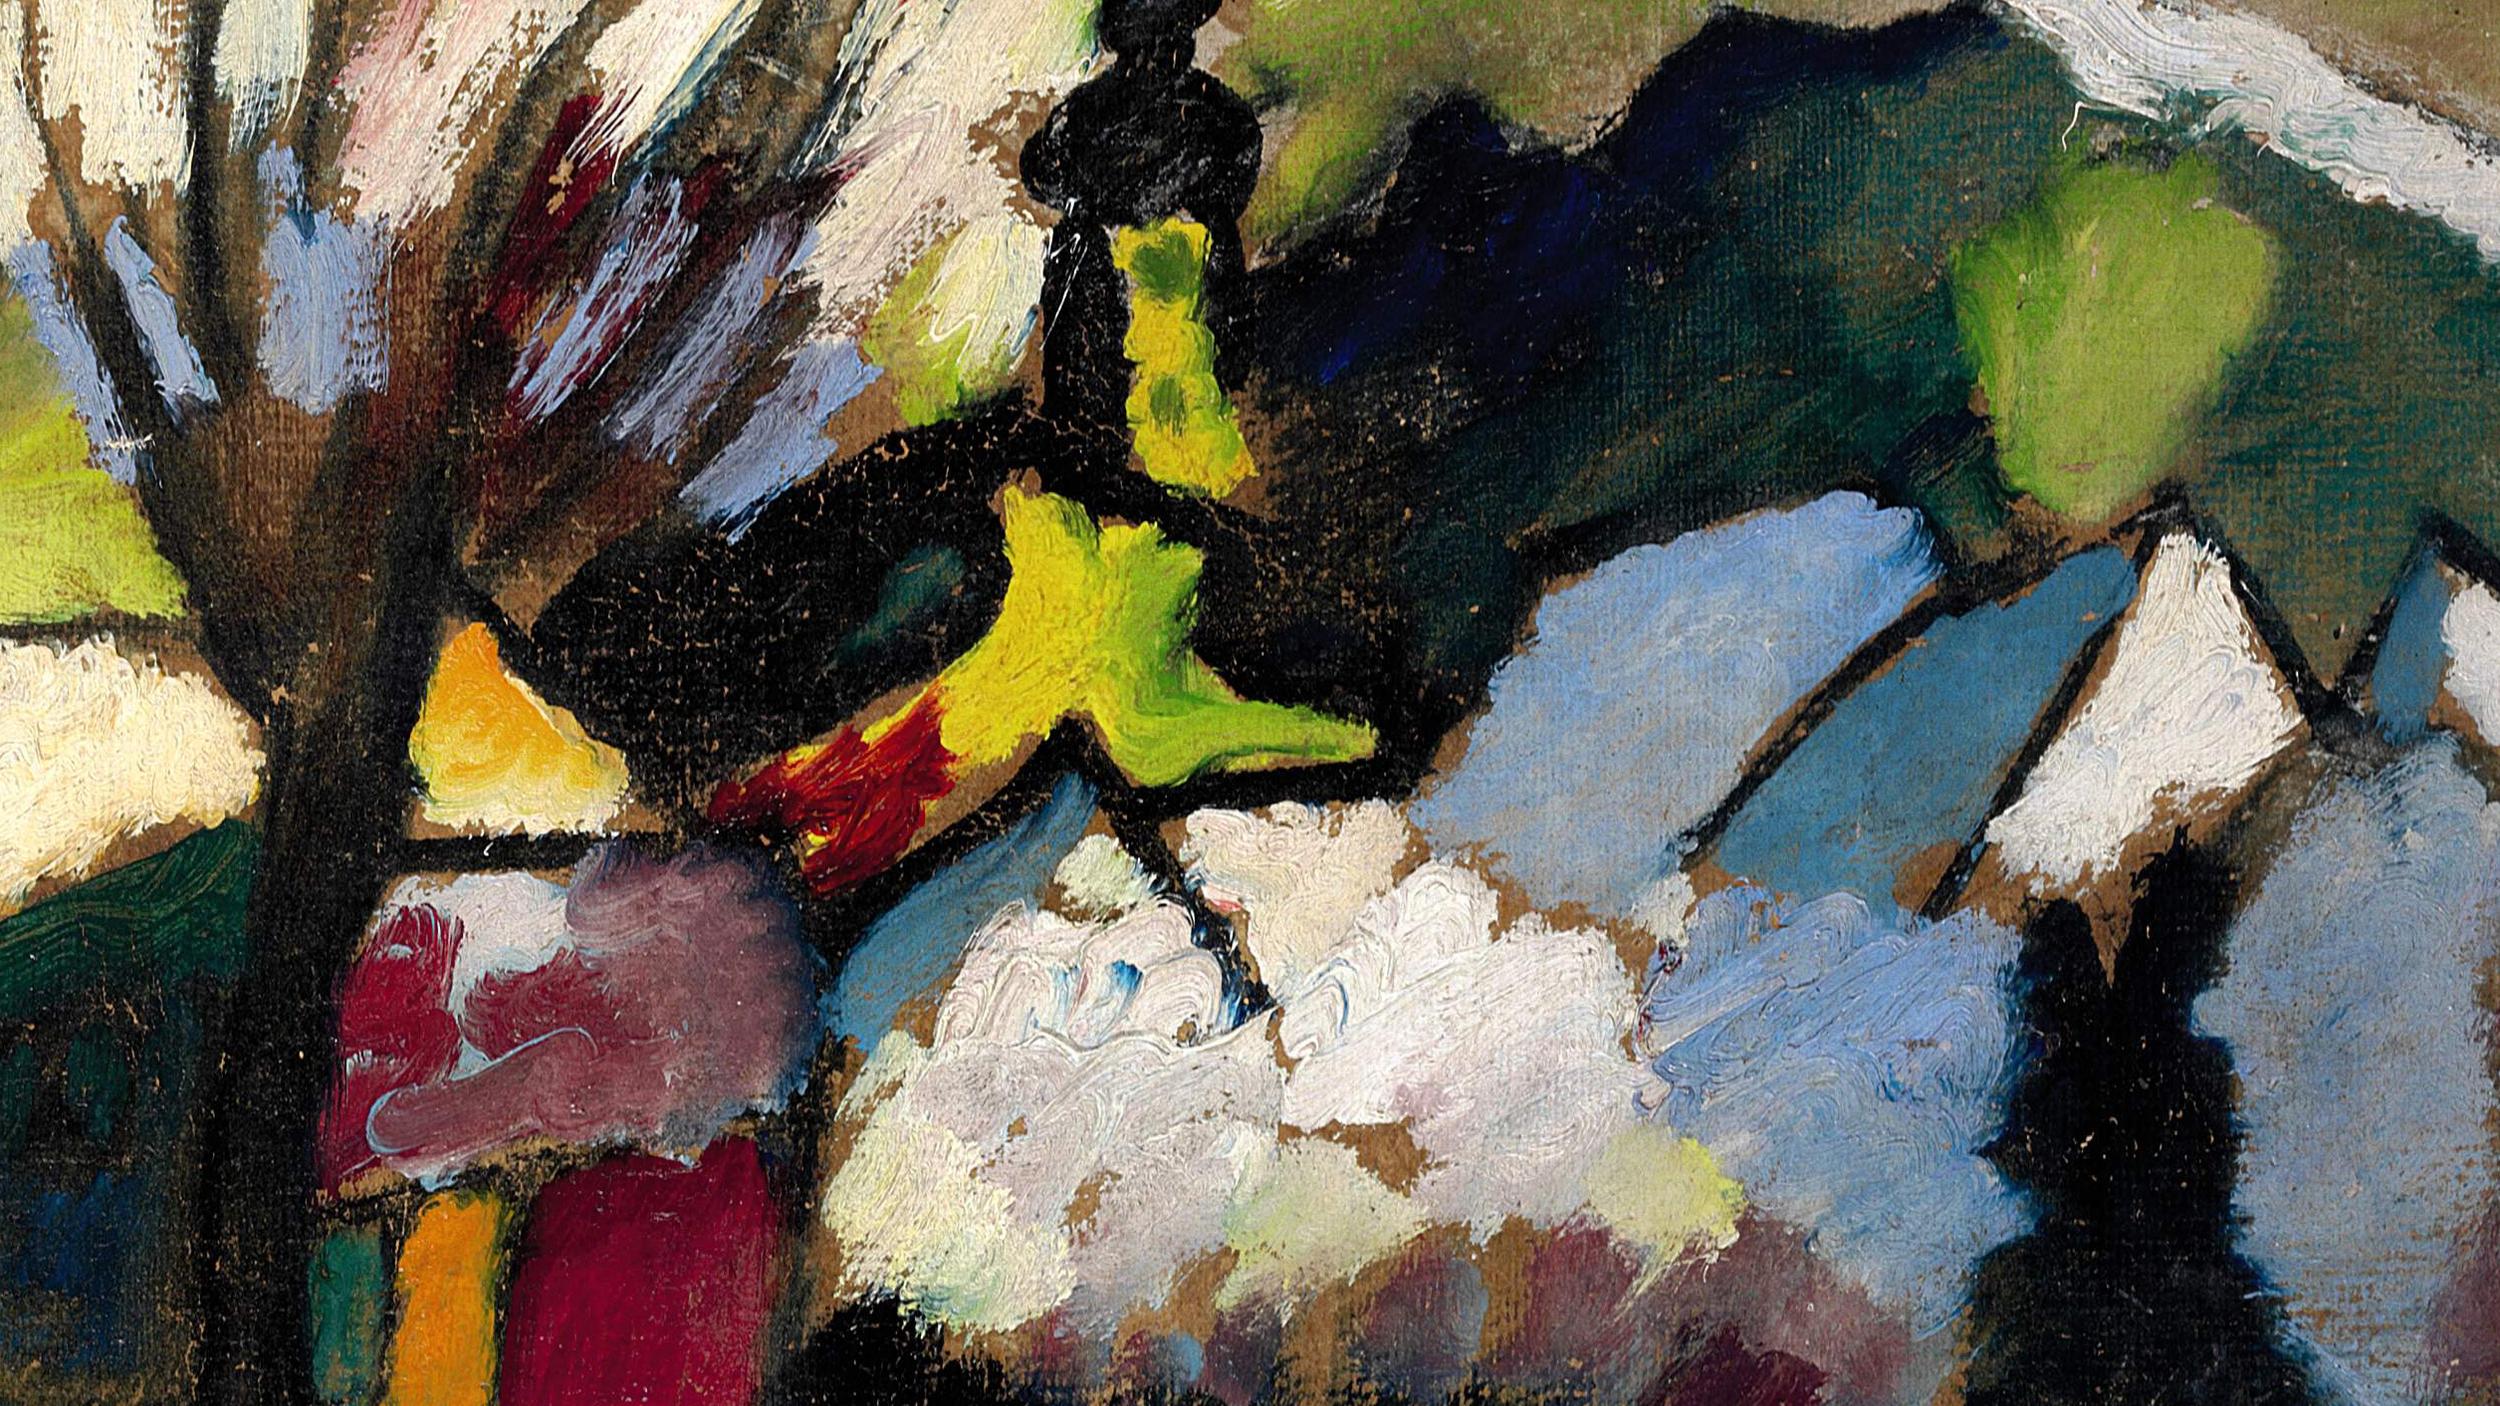 goldhurst-modern-impressionist-art-12.jpg